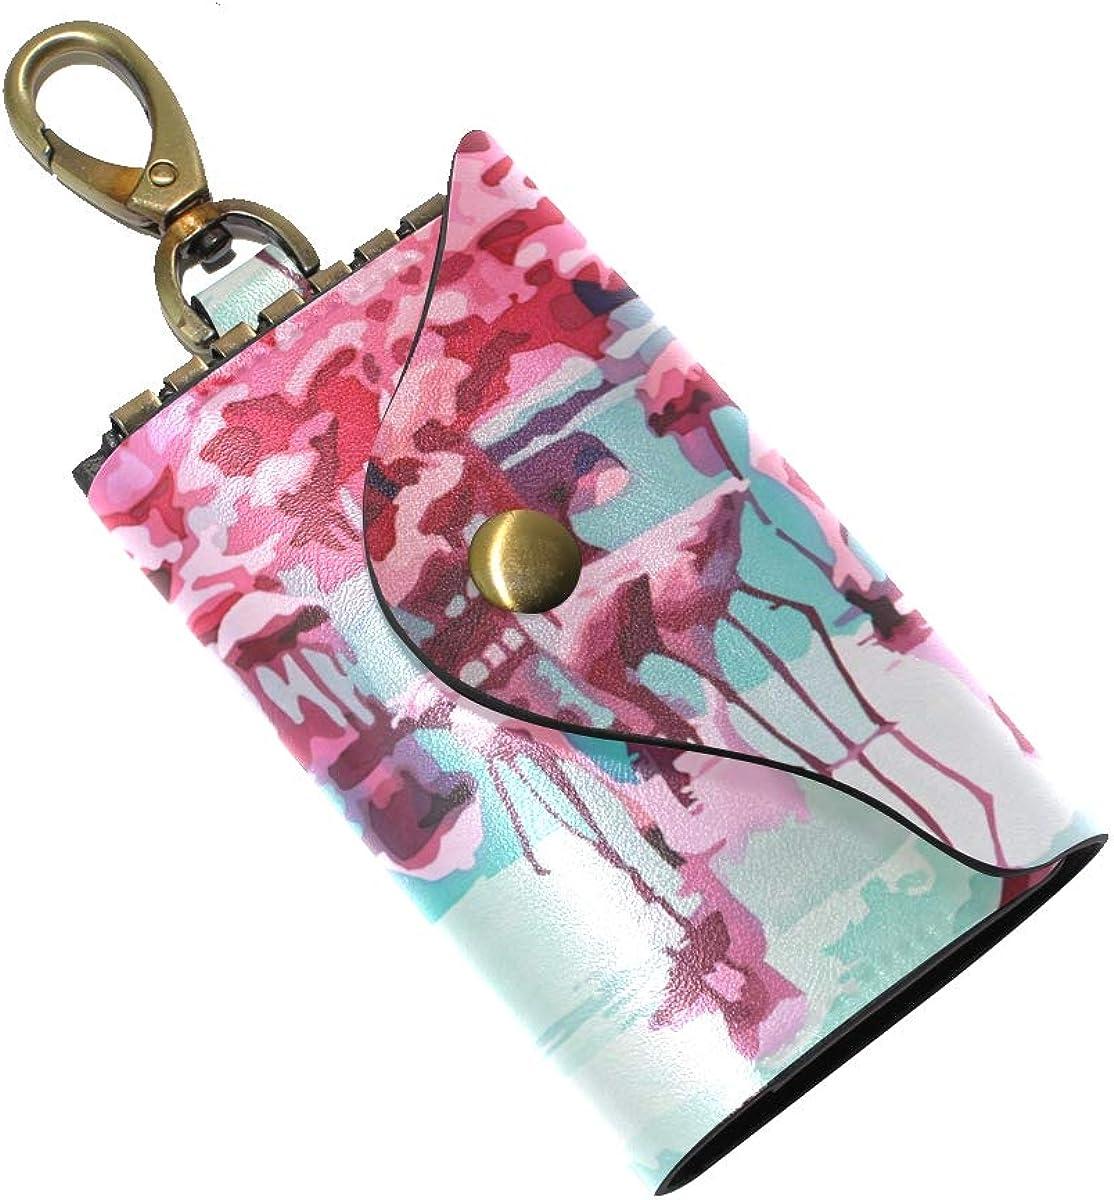 KEAKIA Painting Flamingos Leather Key Case Wallets Tri-fold Key Holder Keychains with 6 Hooks 2 Slot Snap Closure for Men Women